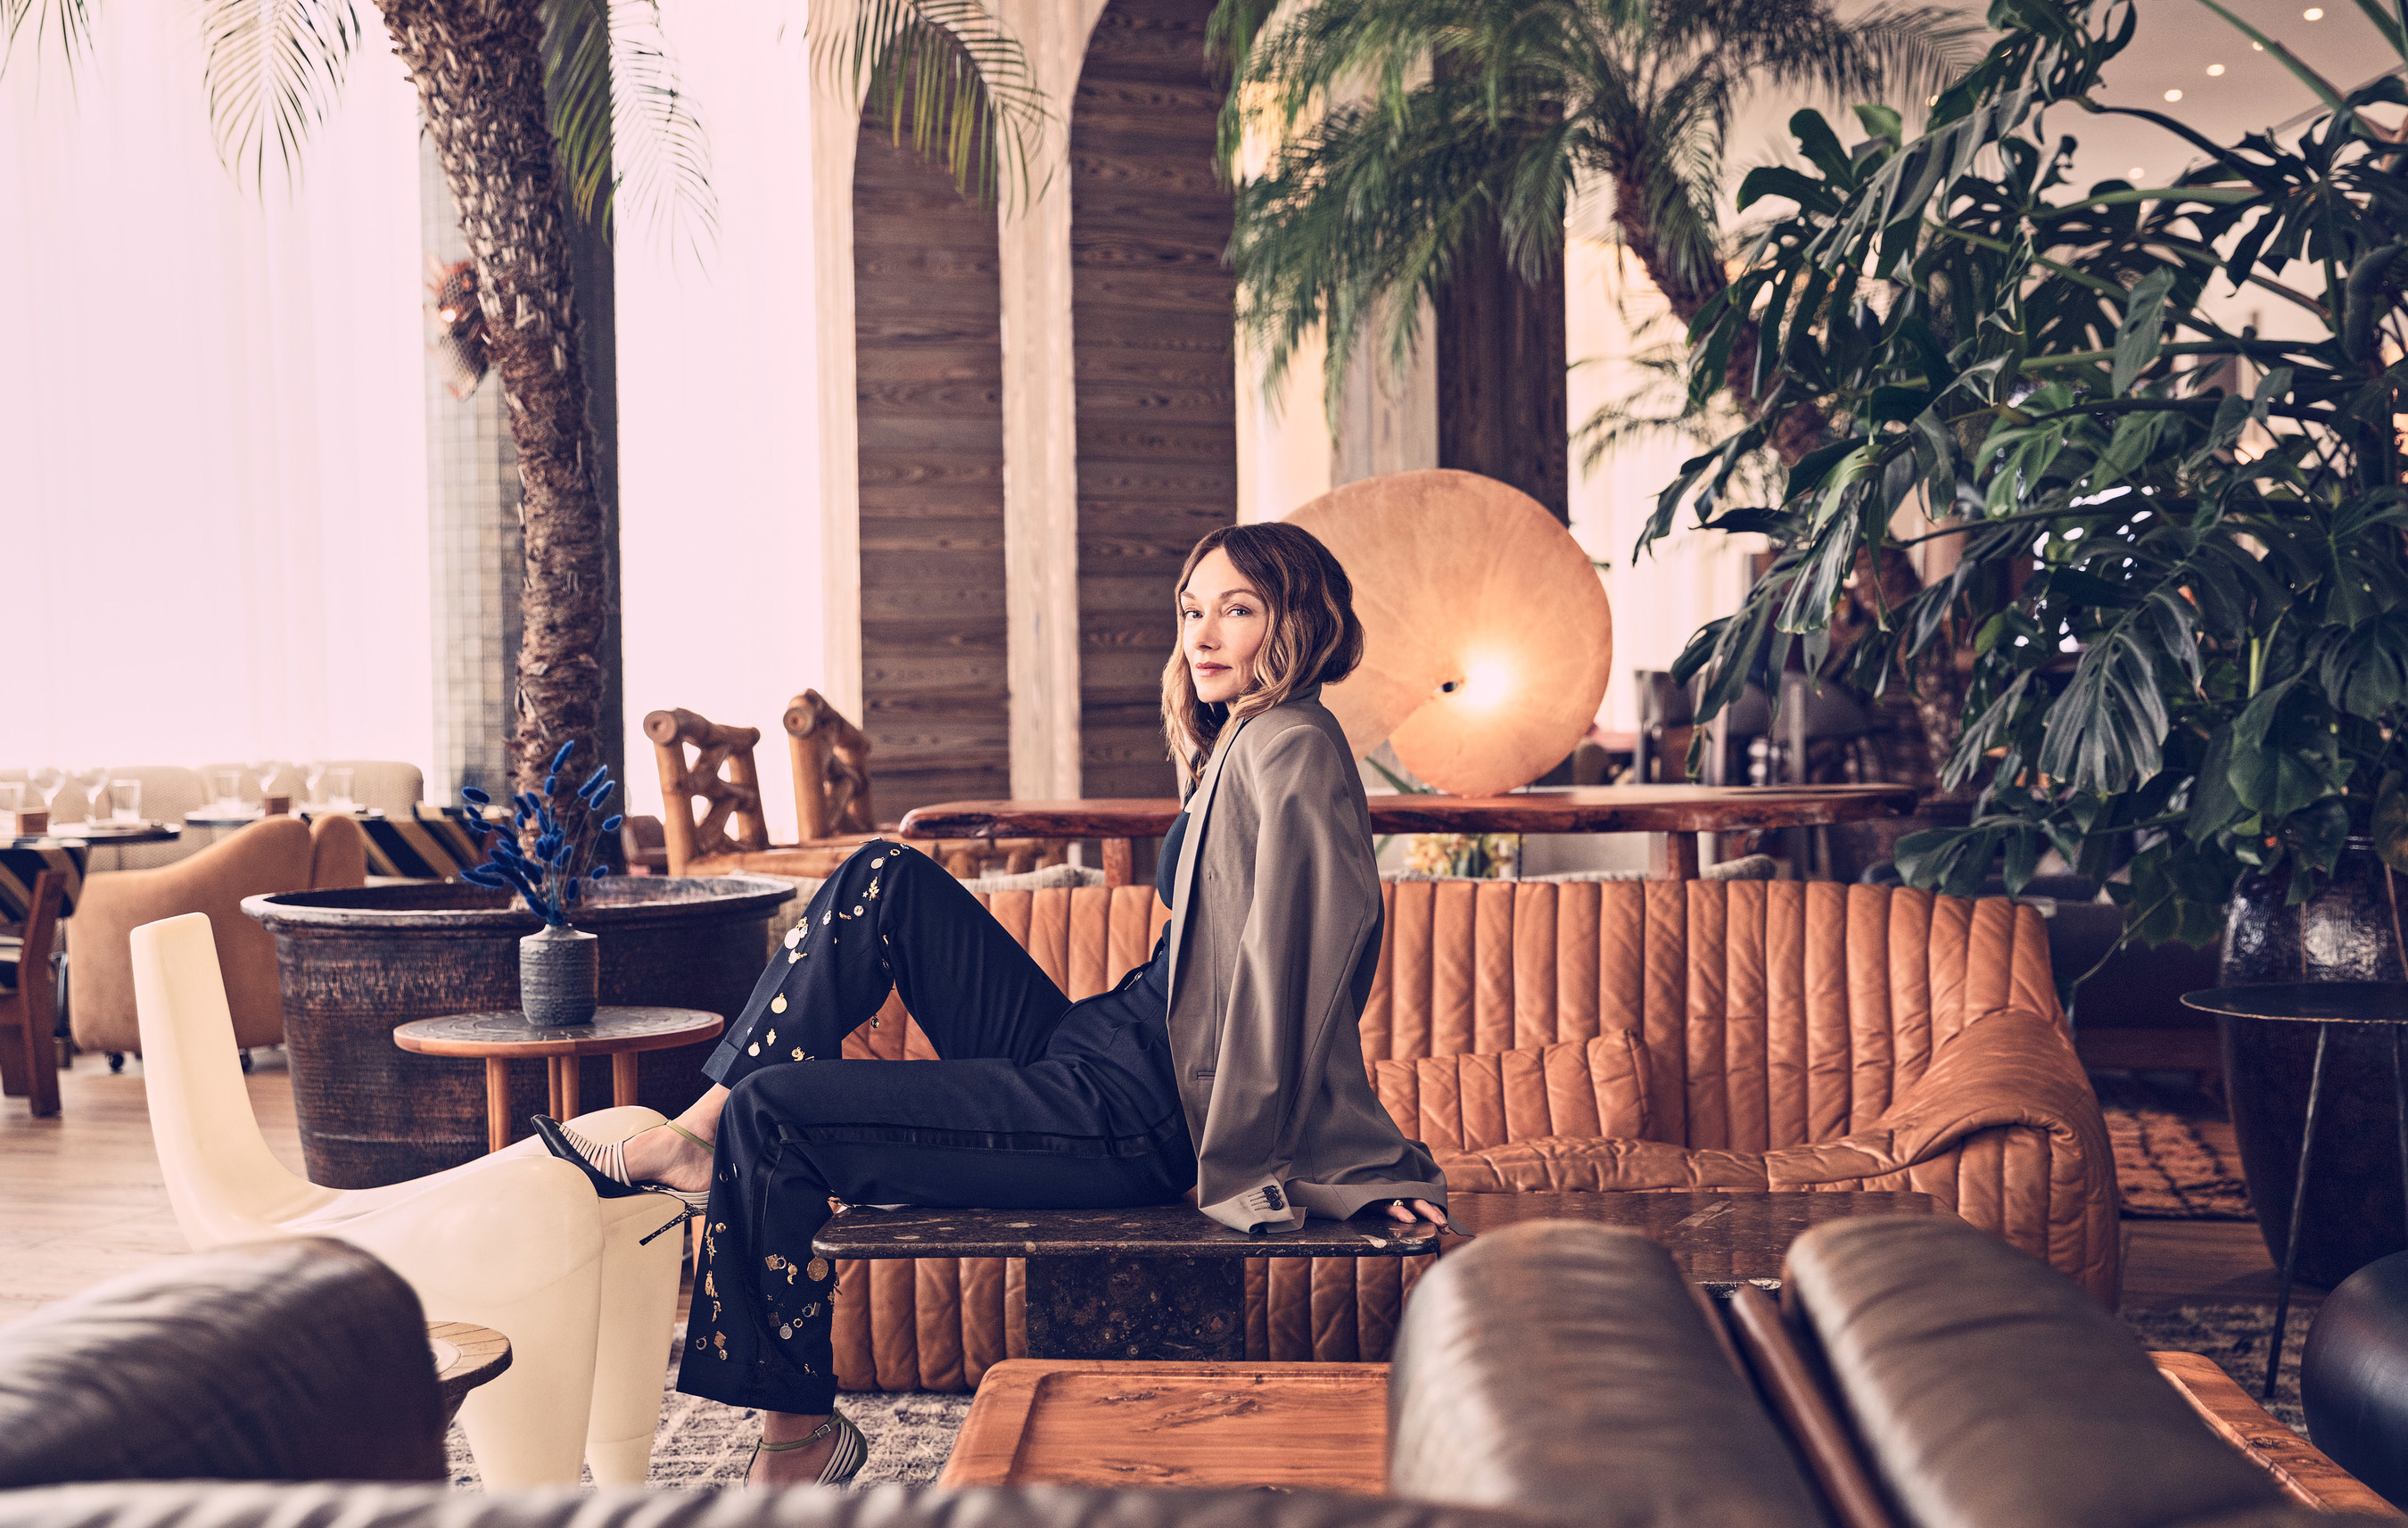 Masterclass Announces Groundbreaking Designer Kelly Wearstler To Teach First Interior Design Class